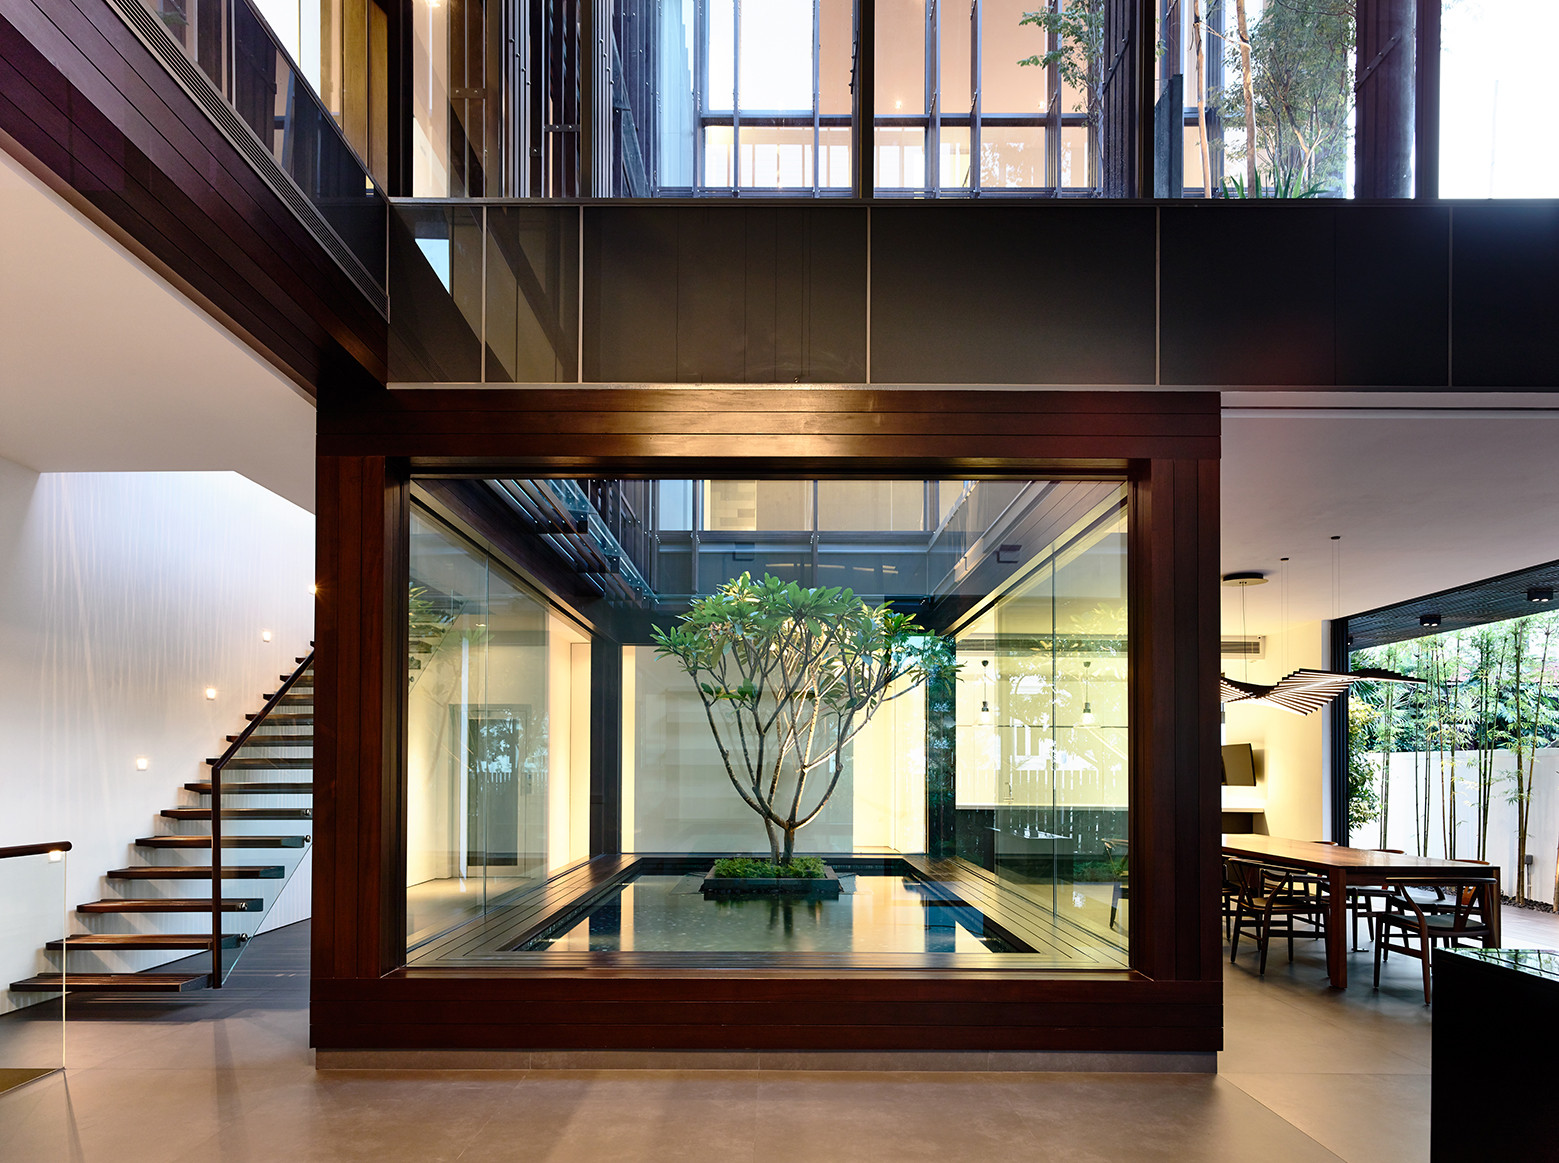 Greenbank Park / HYLA Architects, © Derek Swalwell